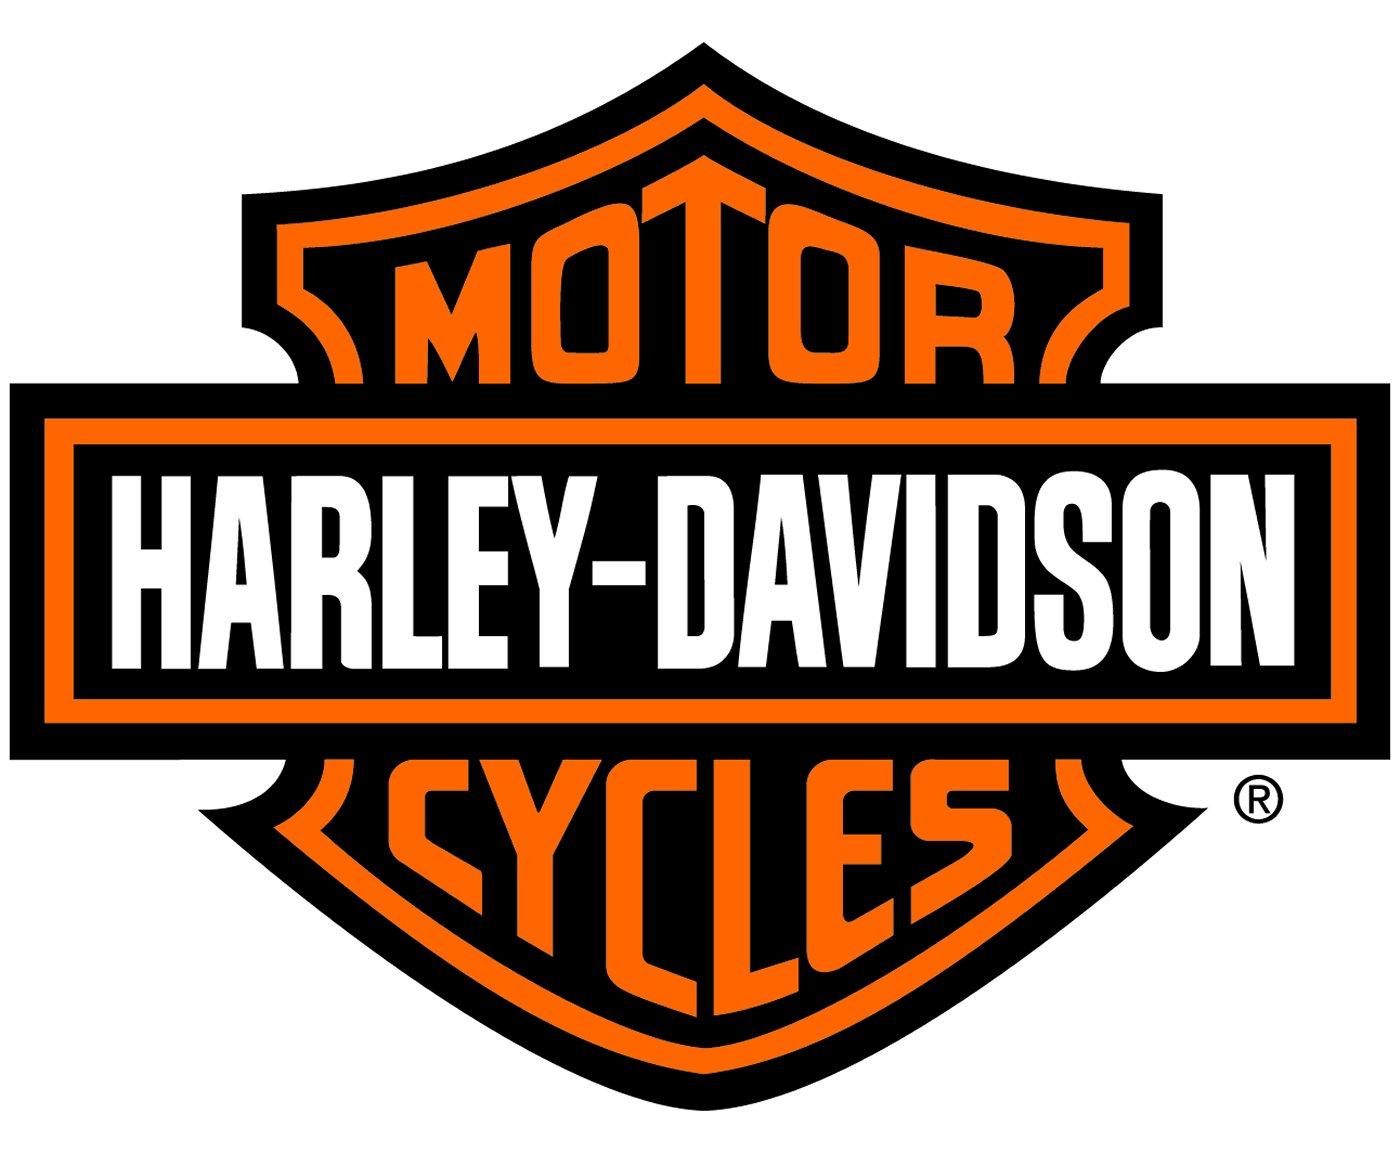 File:Harley davidson logo.jpg.